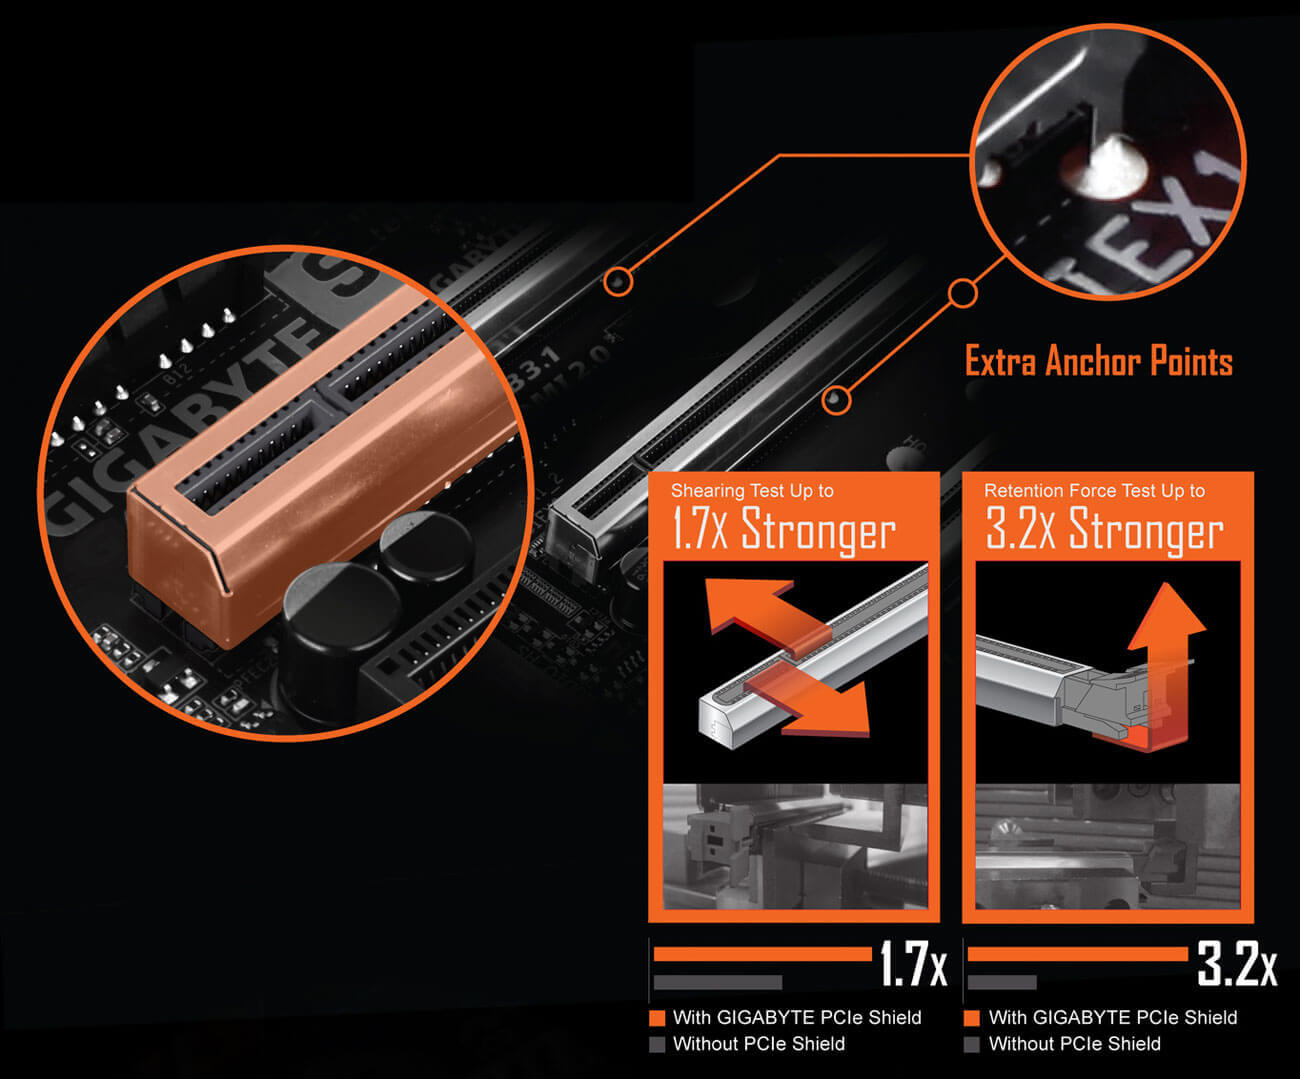 Z390 Aorus Ultra Shearing Force And Bending Moment Diagram Car Tuning Durable Memory Armor